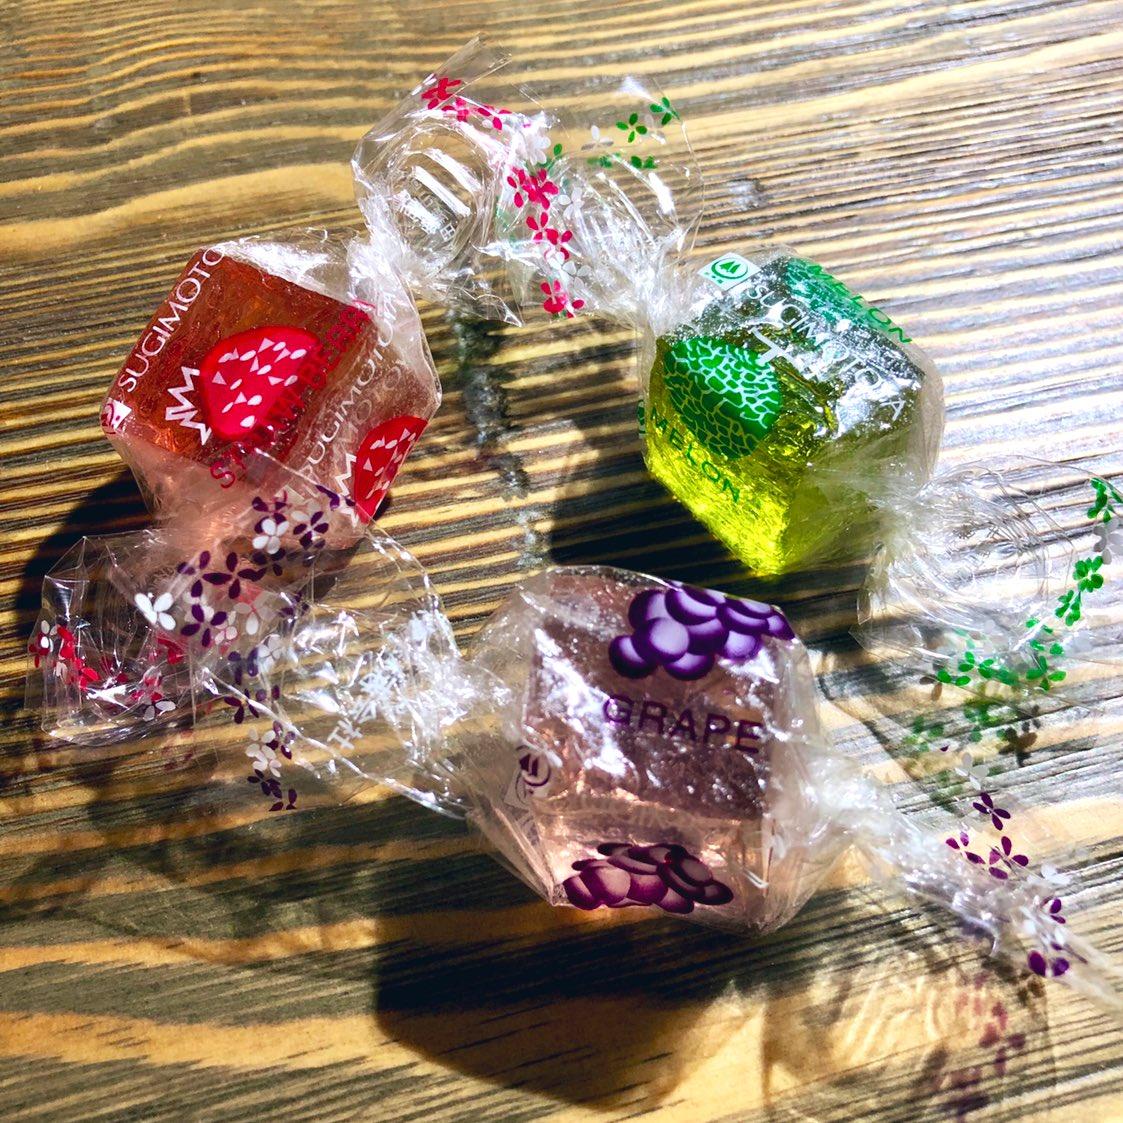 test ツイッターメディア - みすず飴が恋しくて近所のスーパーで買ったハイミックスゼリー。差はフルーツ感かな。 https://t.co/fxzEejnSue